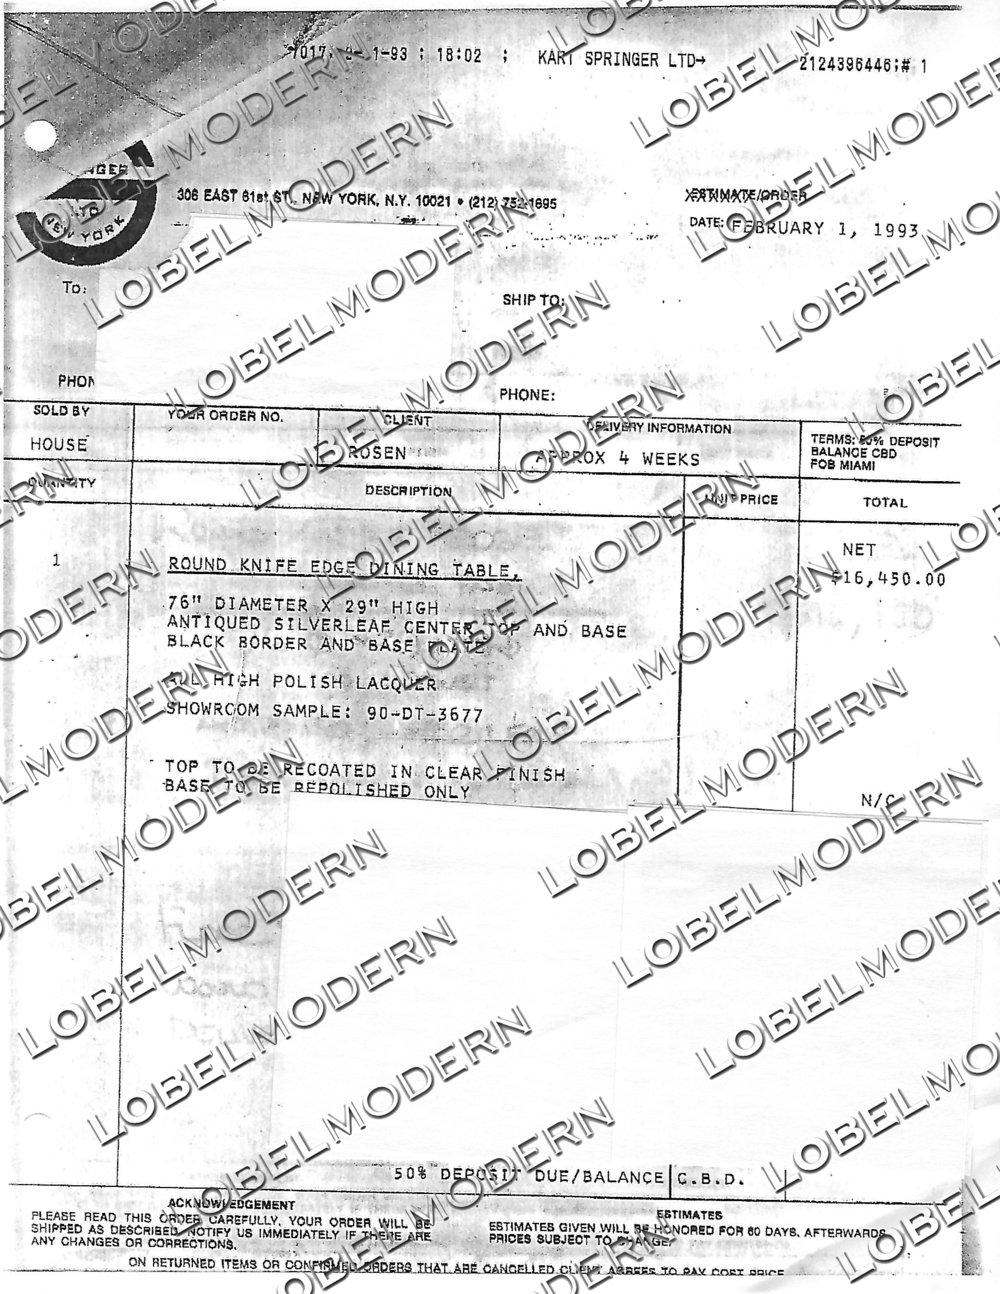 Springer 350 rnd Knife Edge silver diningtable169 invoice watermark.jpg